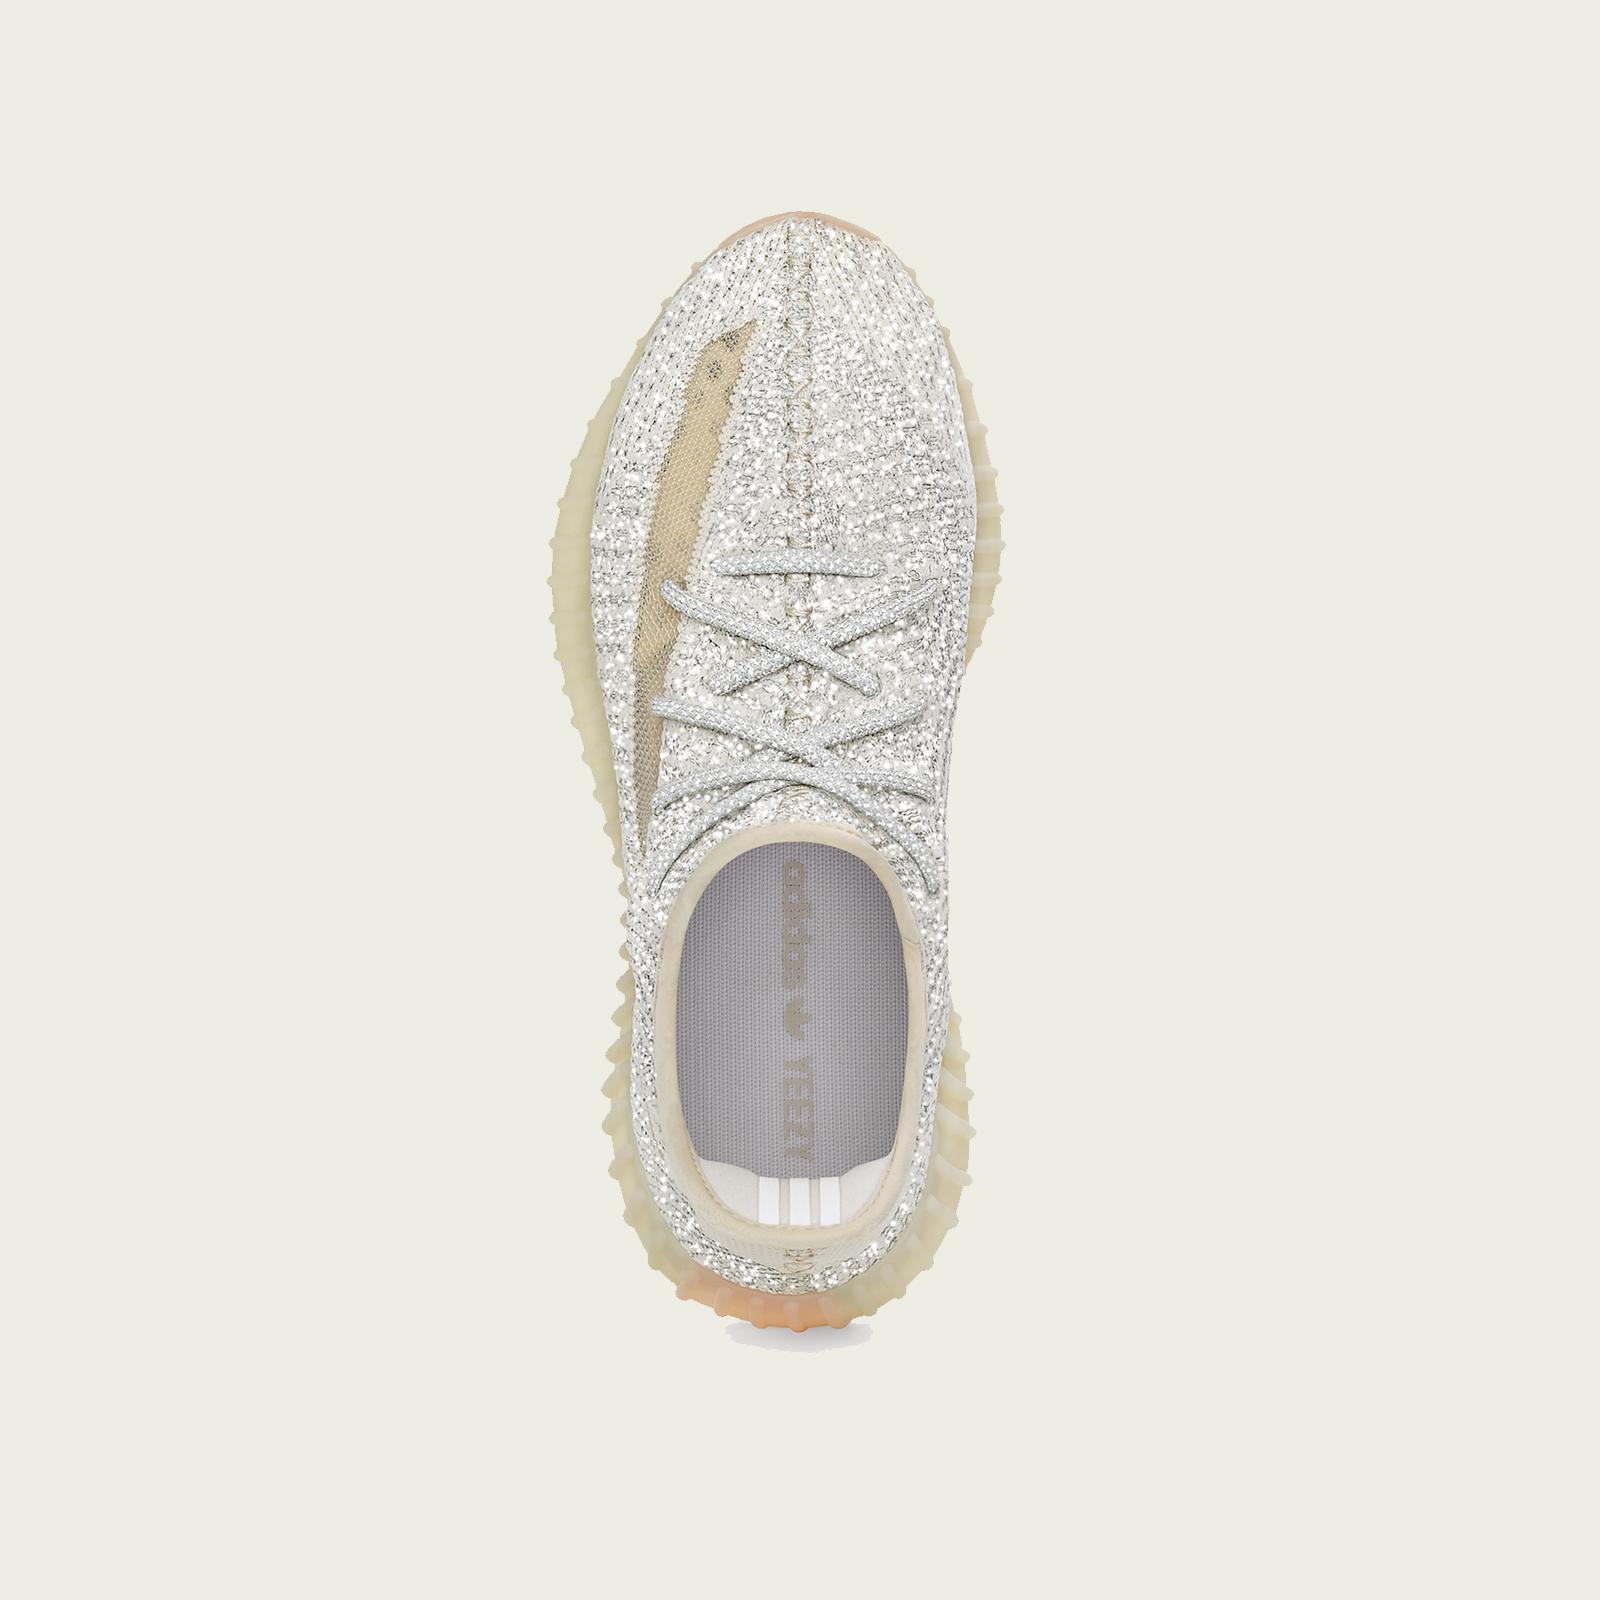 04-adidas-yeezy-boost-350-v2-lundmark-reflective-fv3254